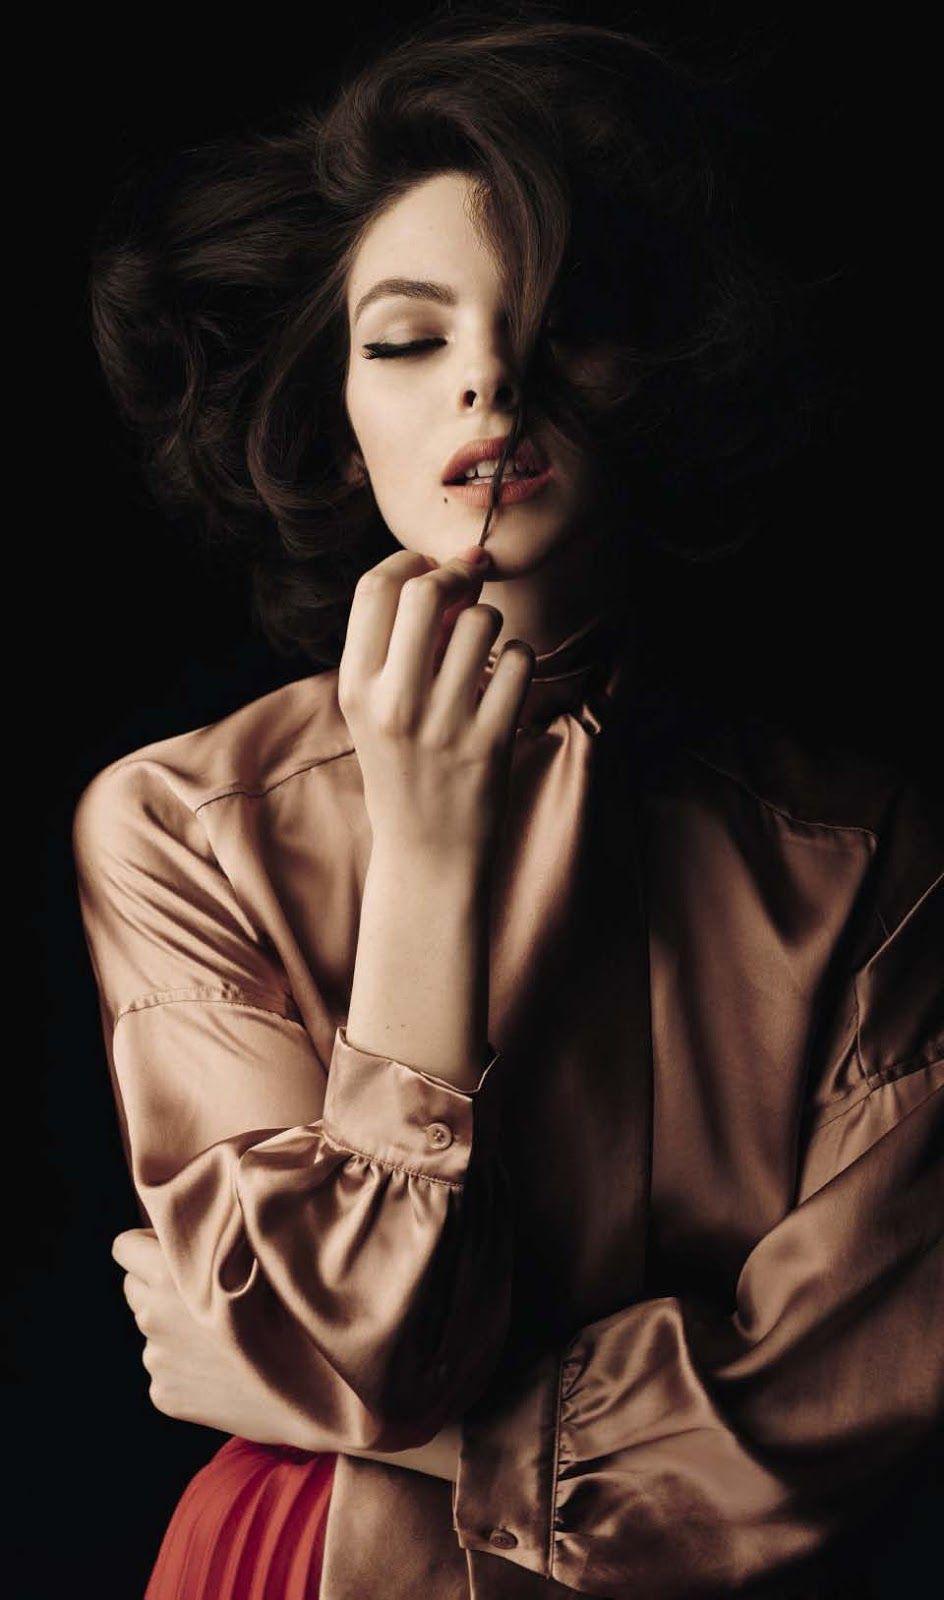 Selfie Vogue Italia December 2017 nude photos 2019